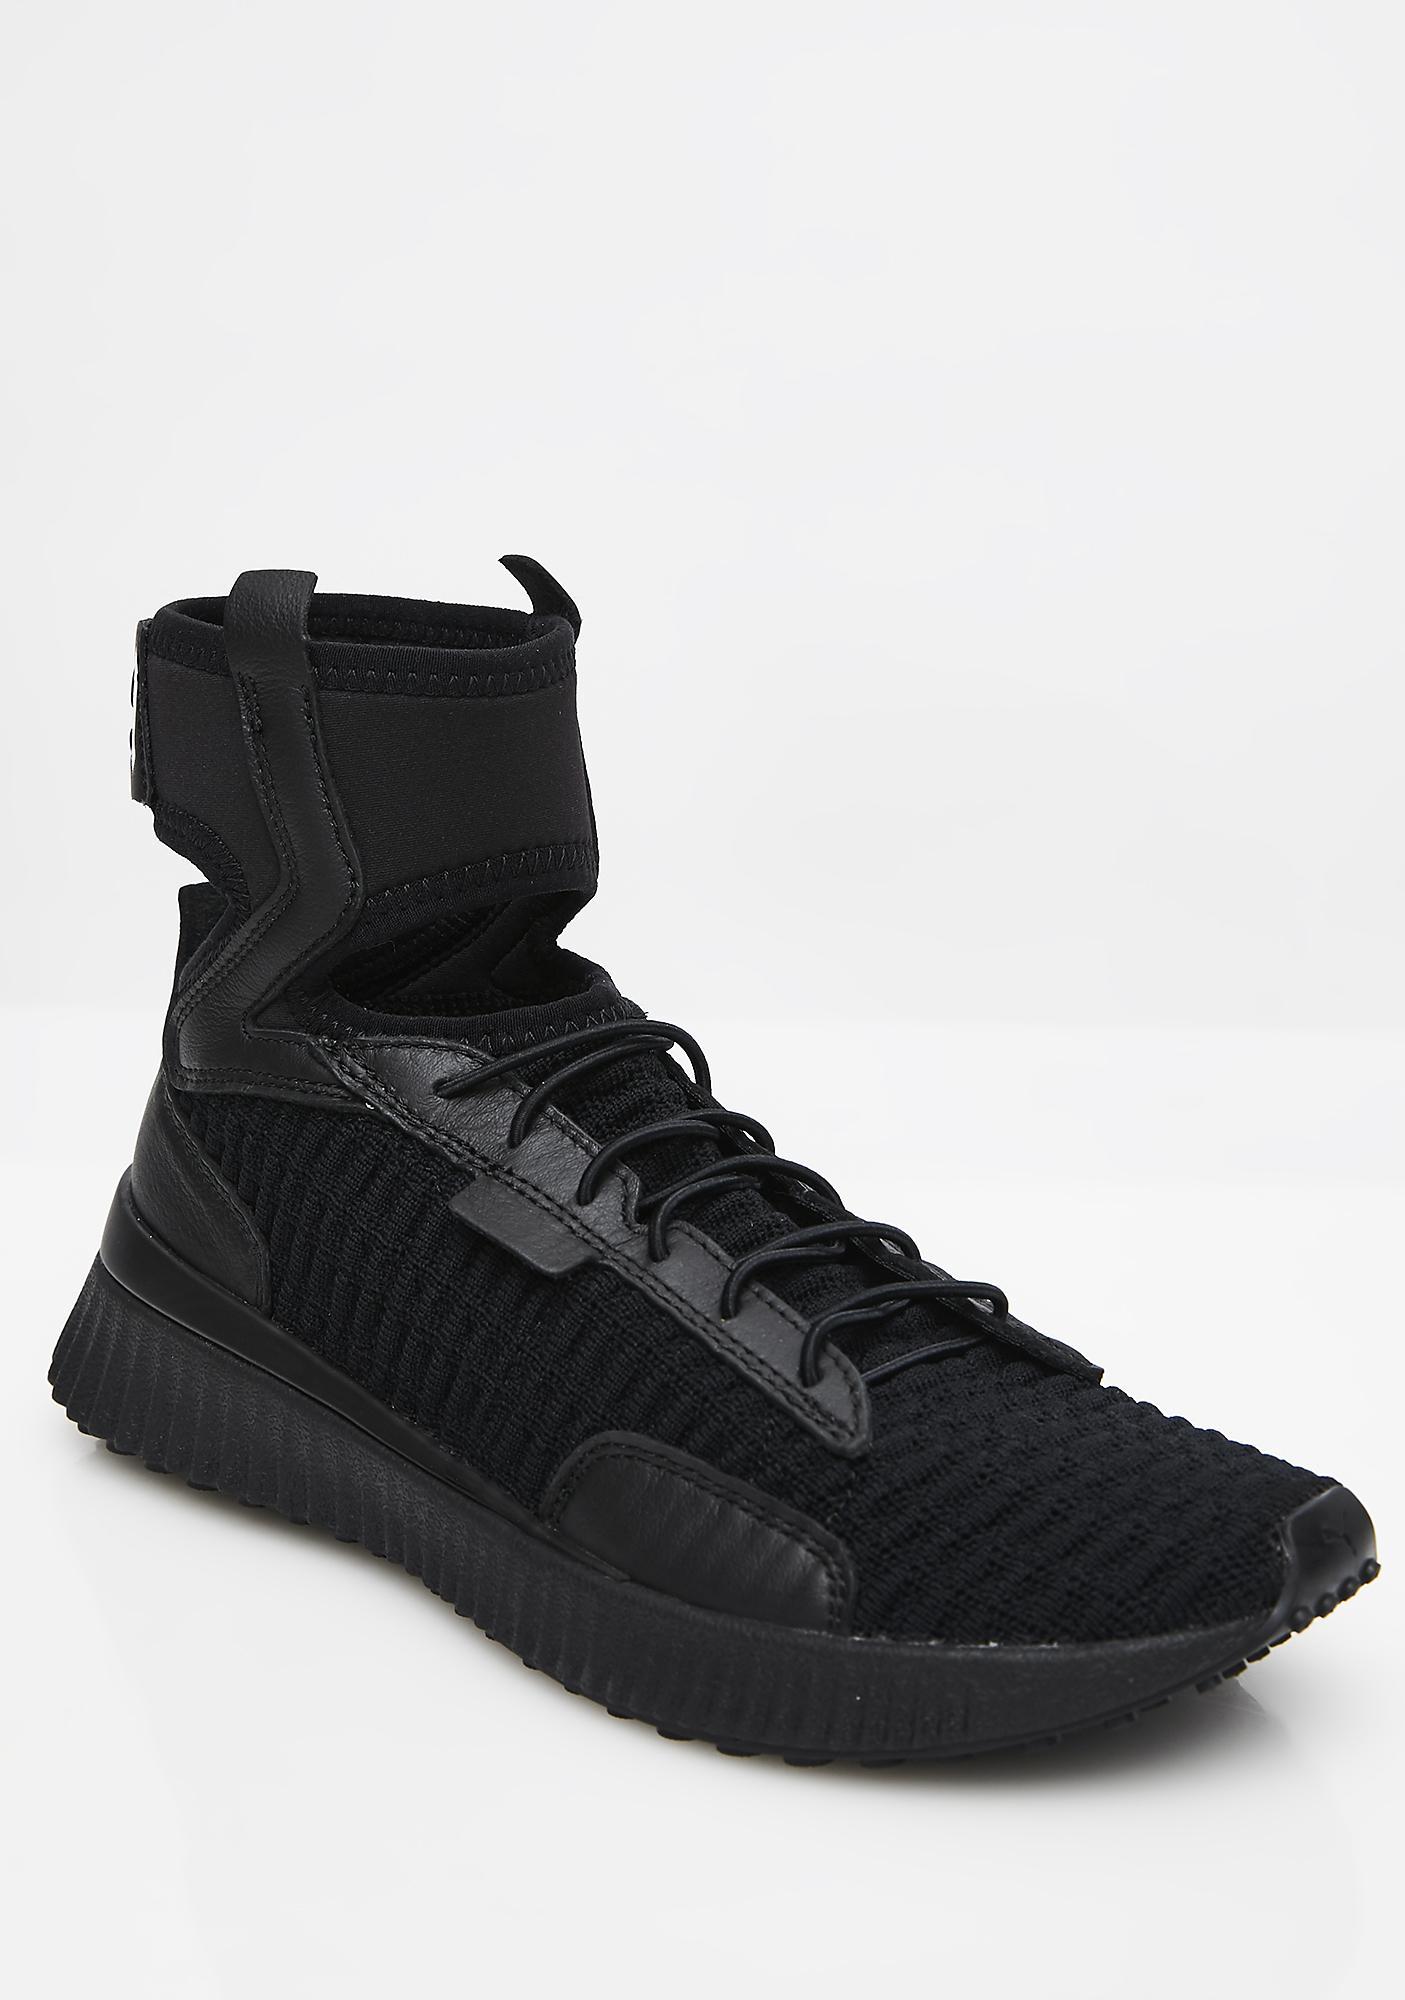 reputable site 07e6e b5ee9 Dark FENTY PUMA By Rihanna Trainer Mid Geo Sneakers